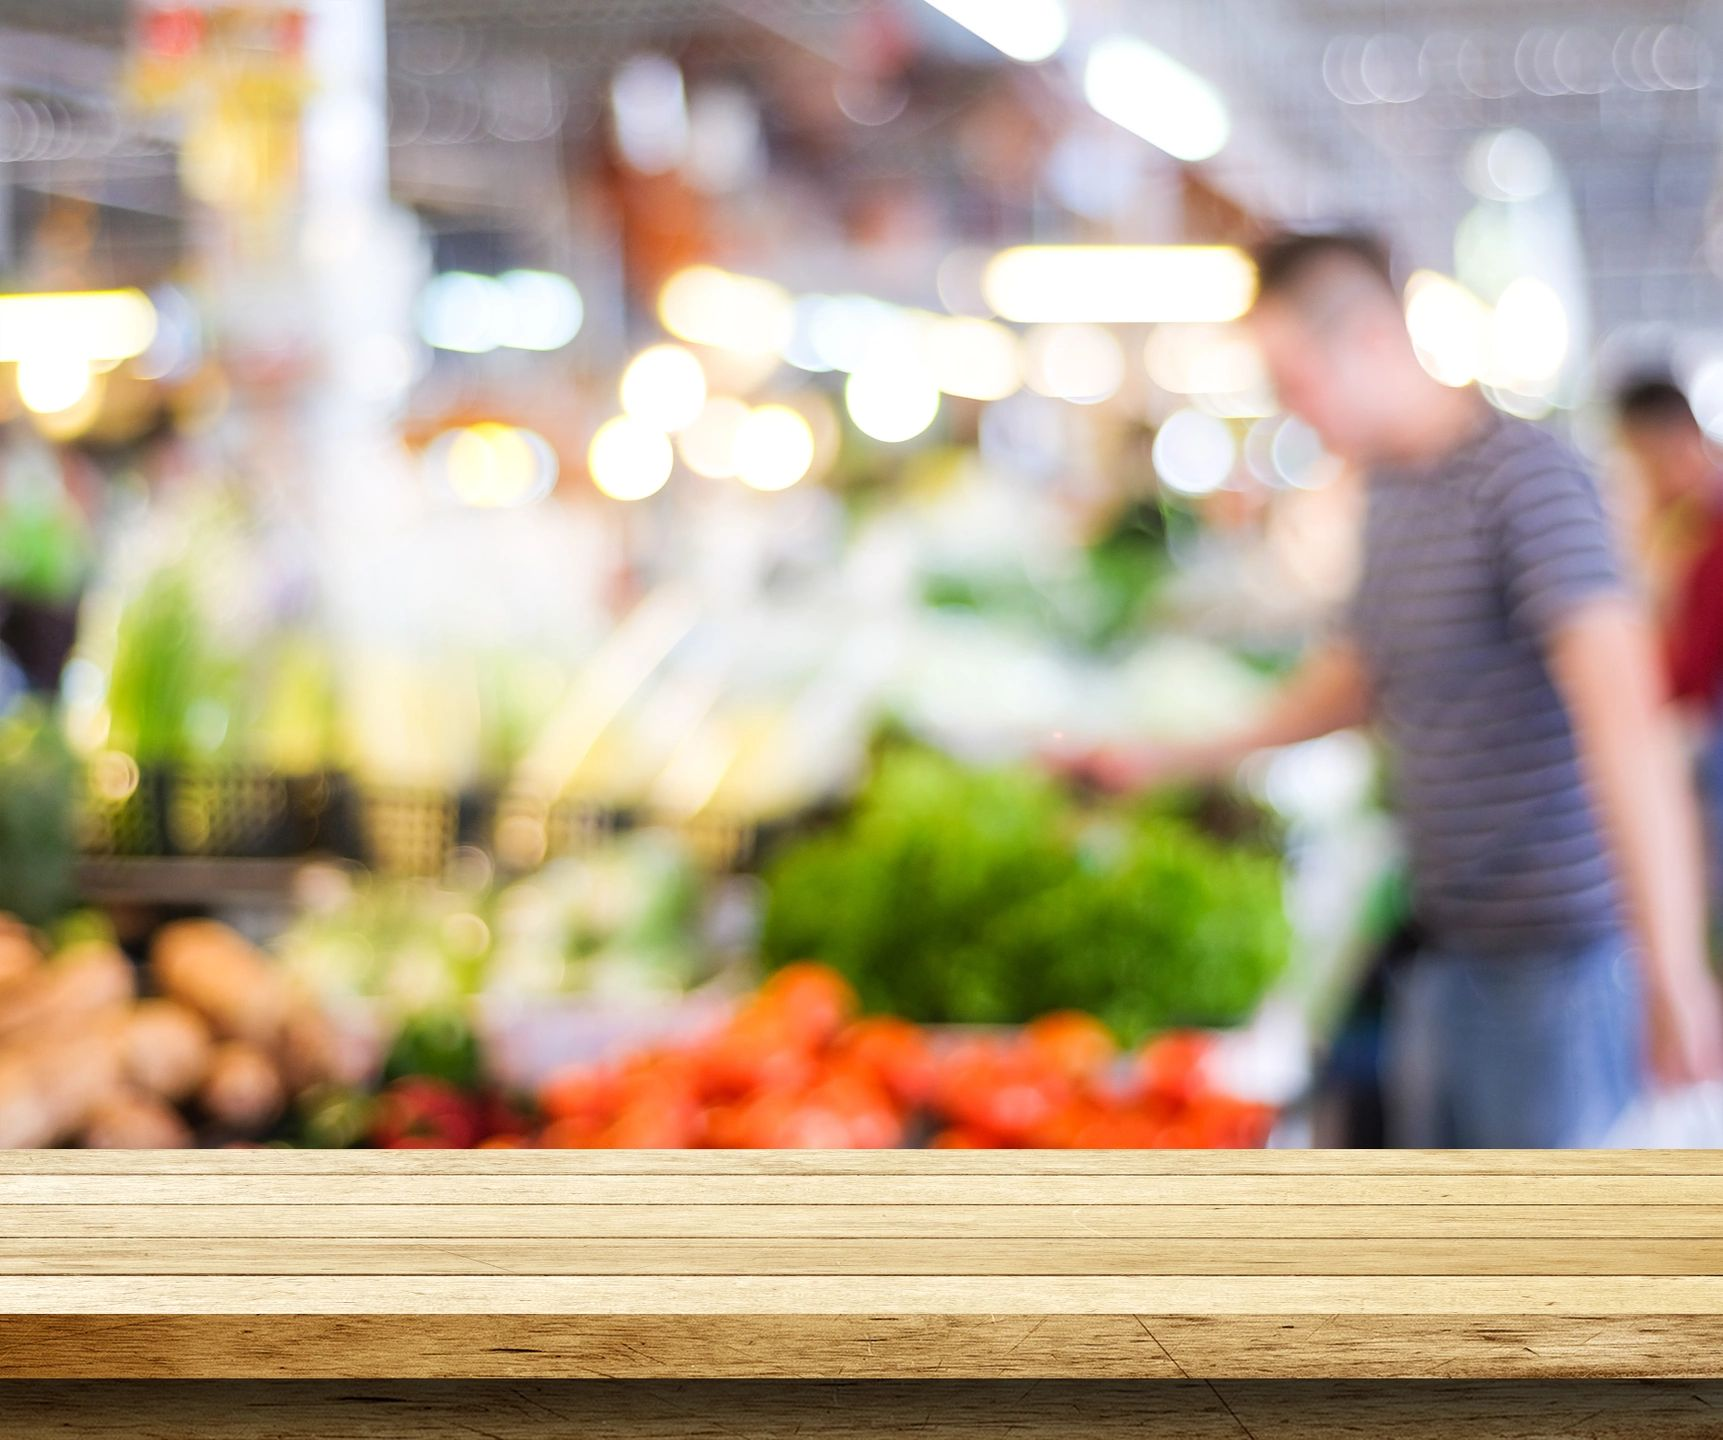 Nutrition Spotlight: Detox with Vegetables